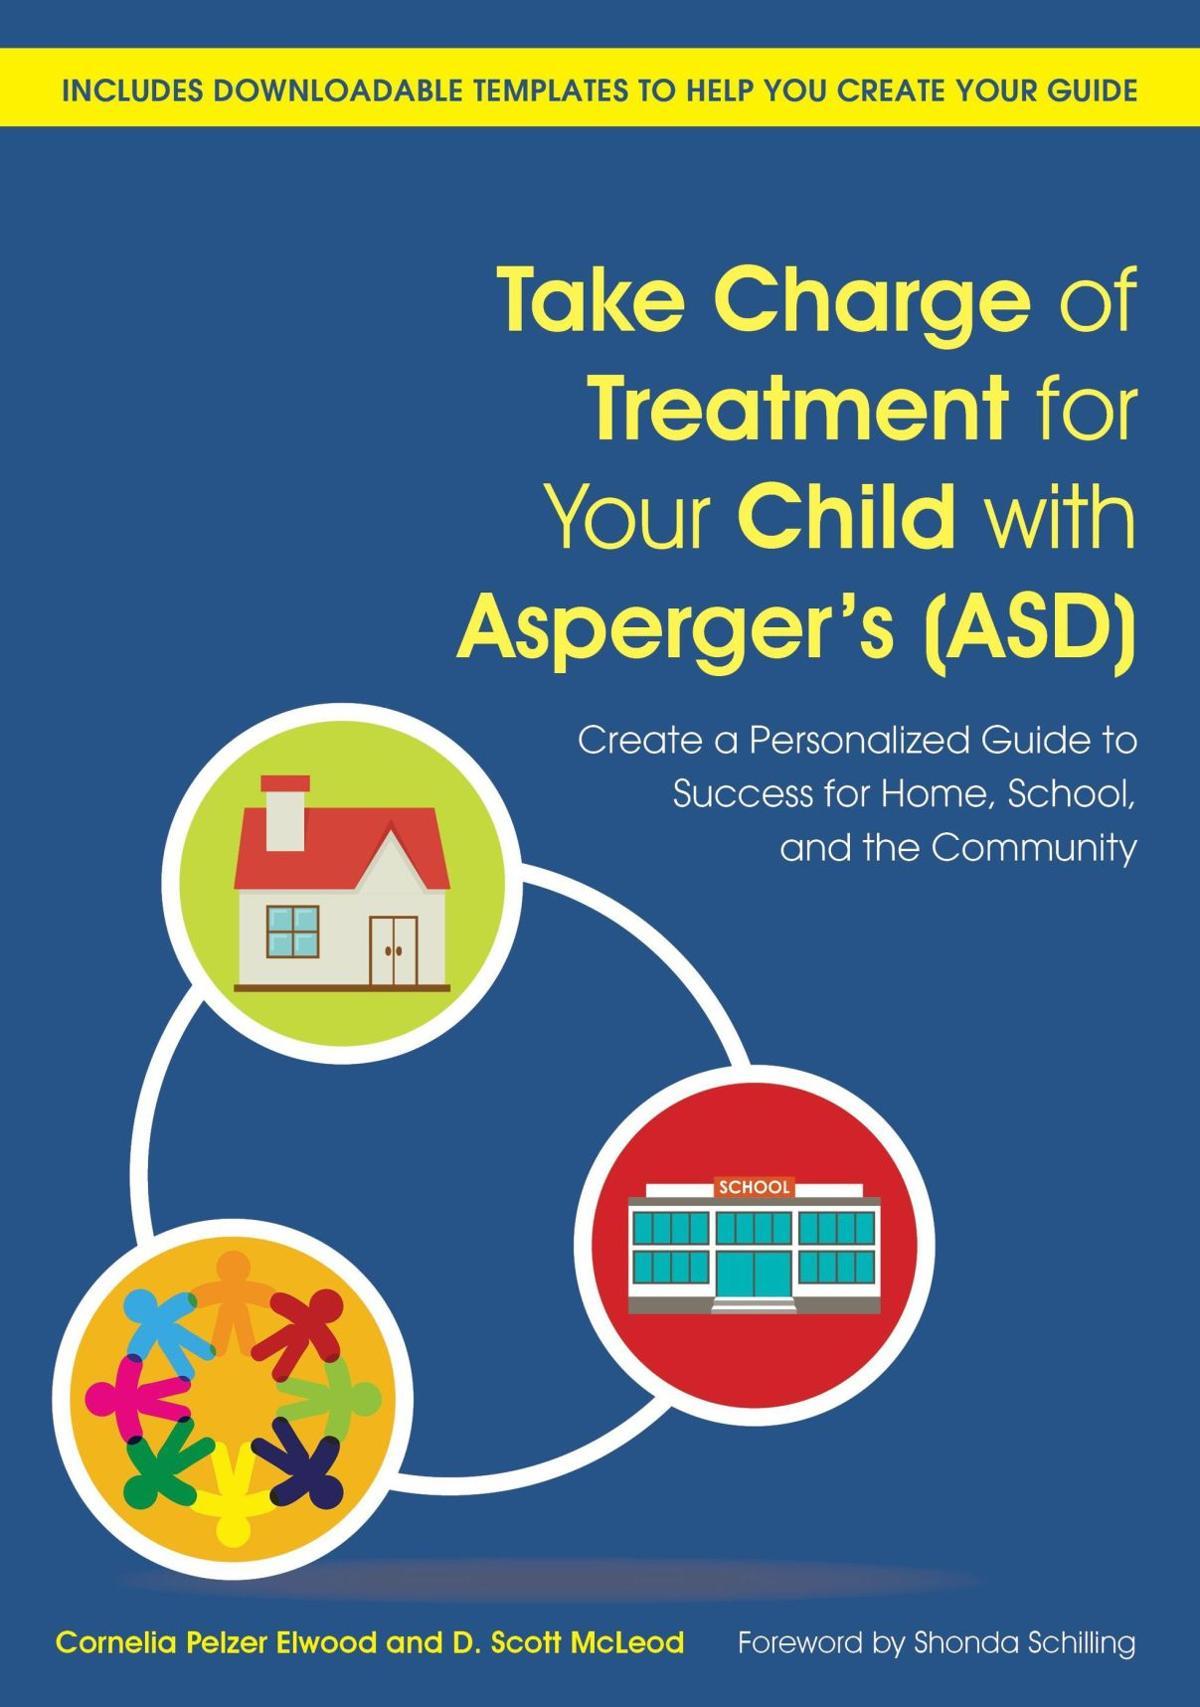 Book targets parents raising children with Asperger's